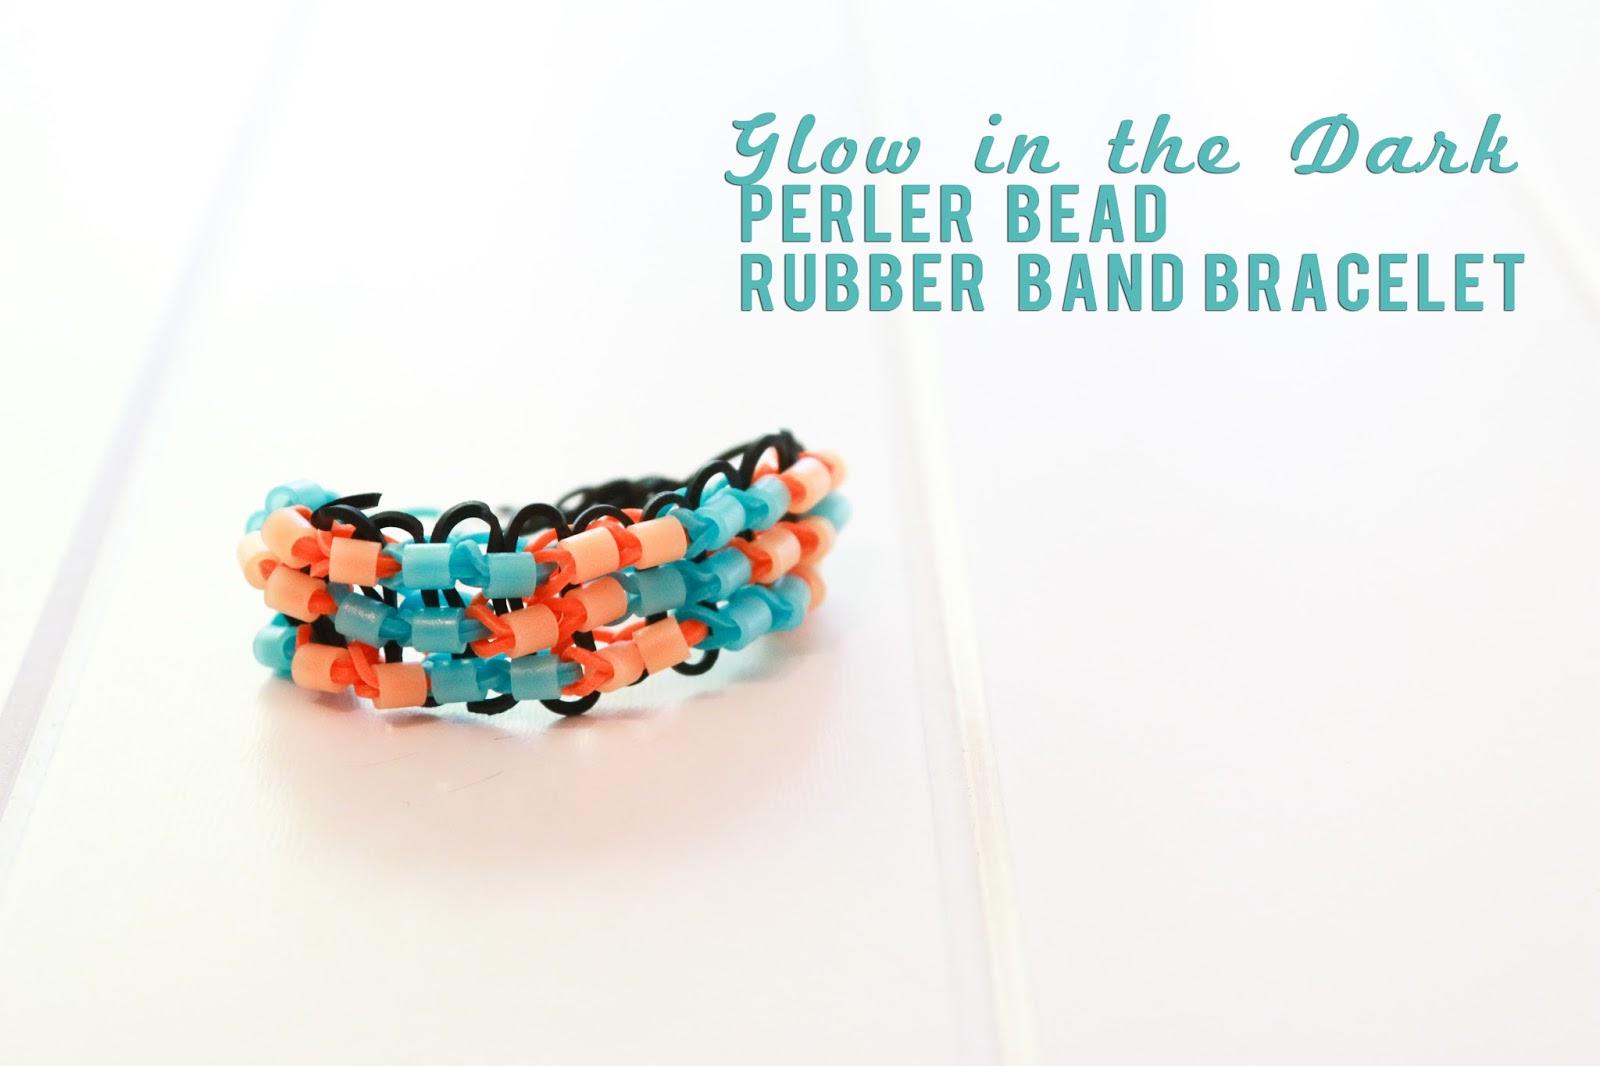 Glow in the Dark Perler Bead Rubber Band Bracelet @createoften @craftsavvy #craftwarehouse #loombands #rubberbandbracelets #perler